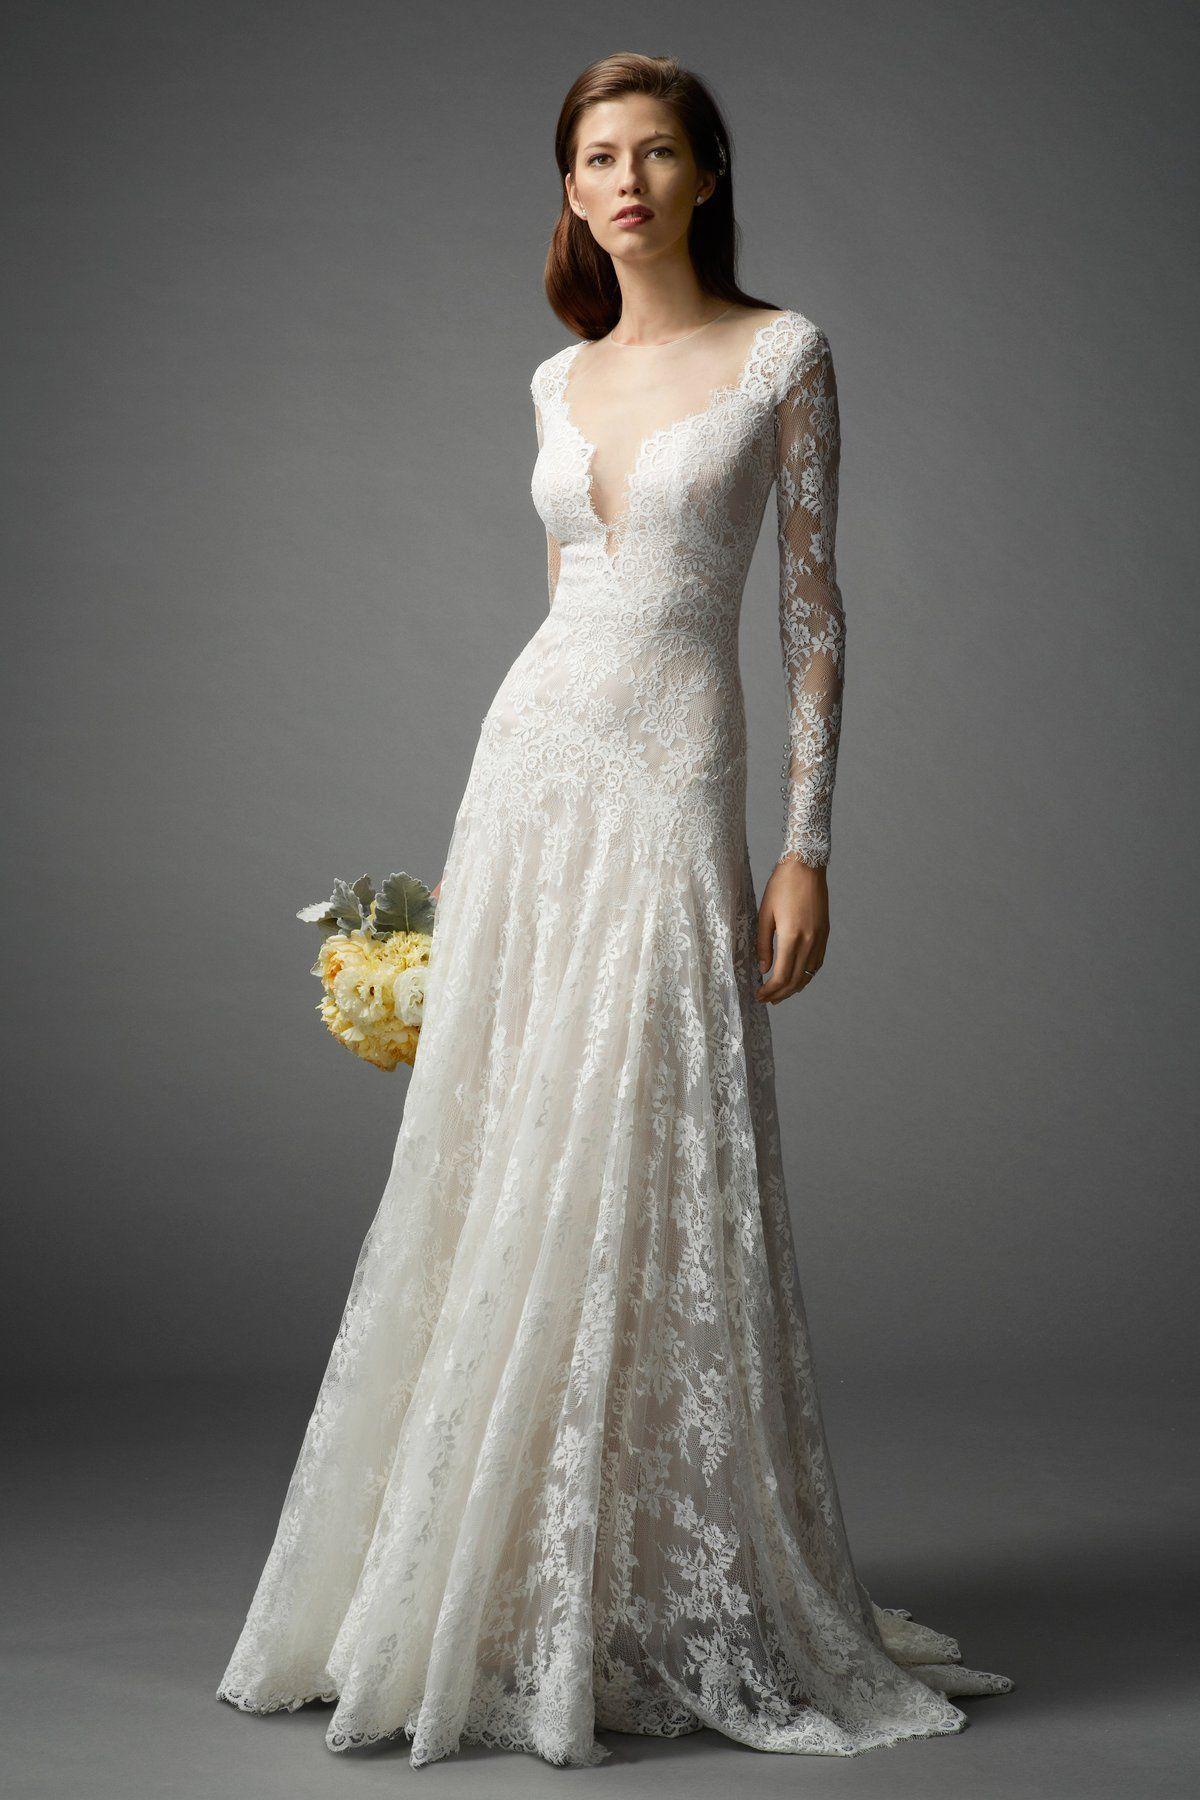 Httpwattersproductwattersbrides7015b wedding watters brides arcelia gown available at five seasons bridal nassau bahamas junglespirit Gallery